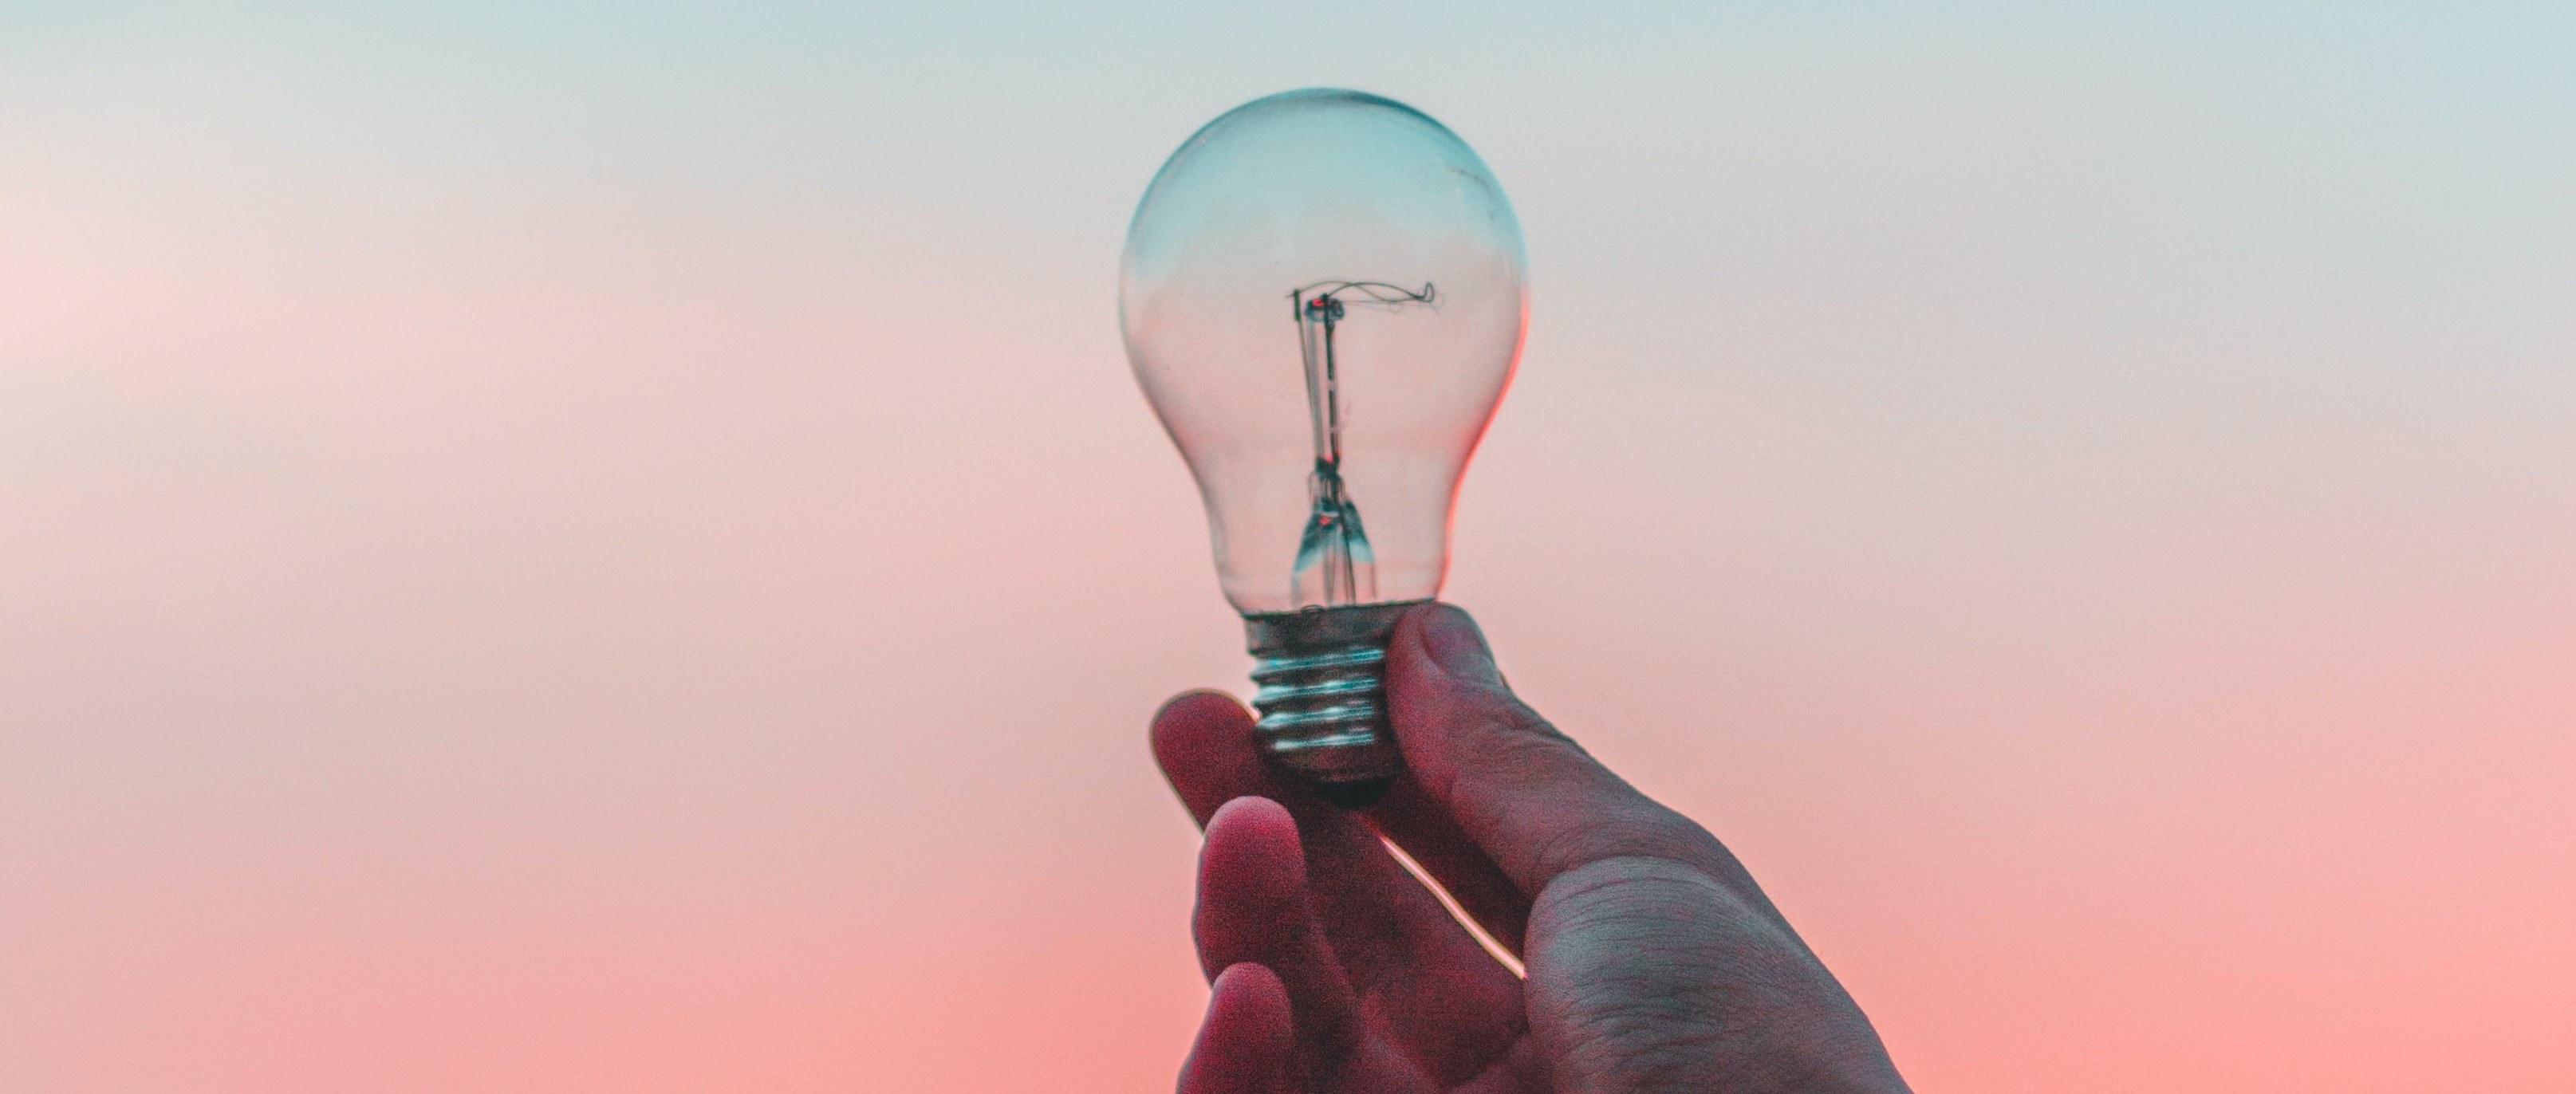 The benefits of blogging lightbulb image